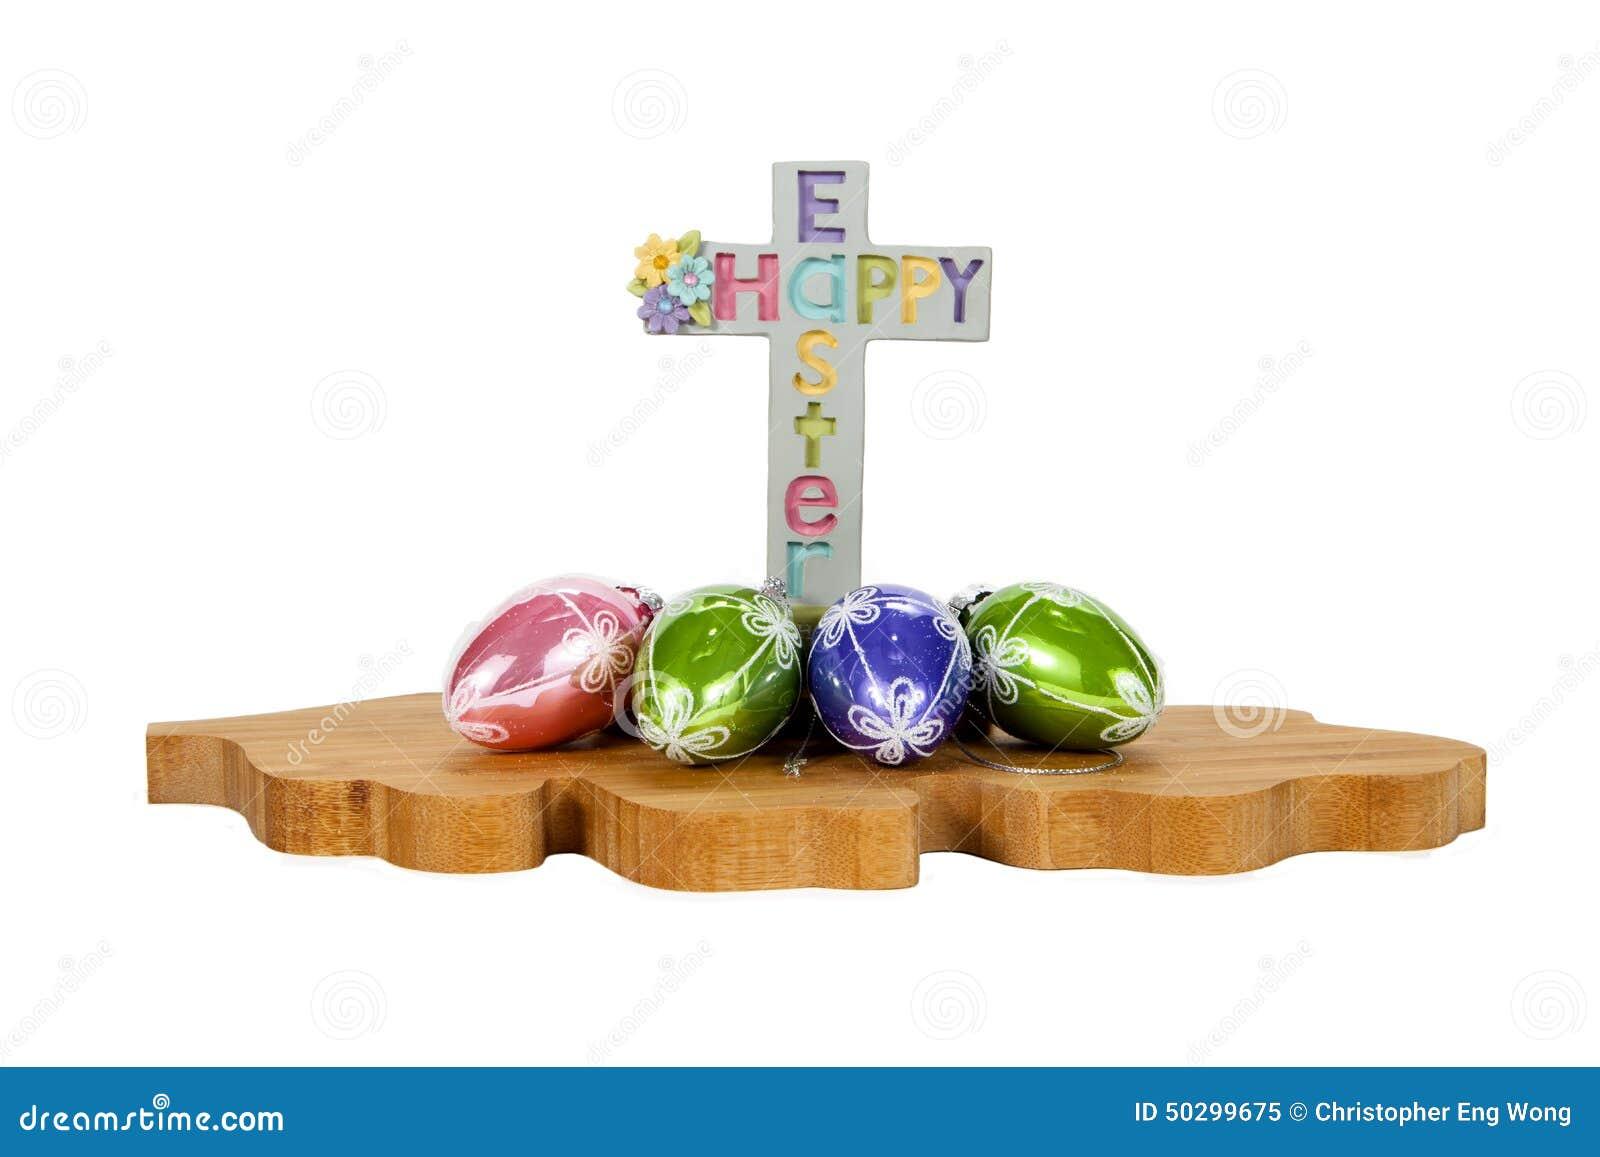 easter eggs happy food - photo #43